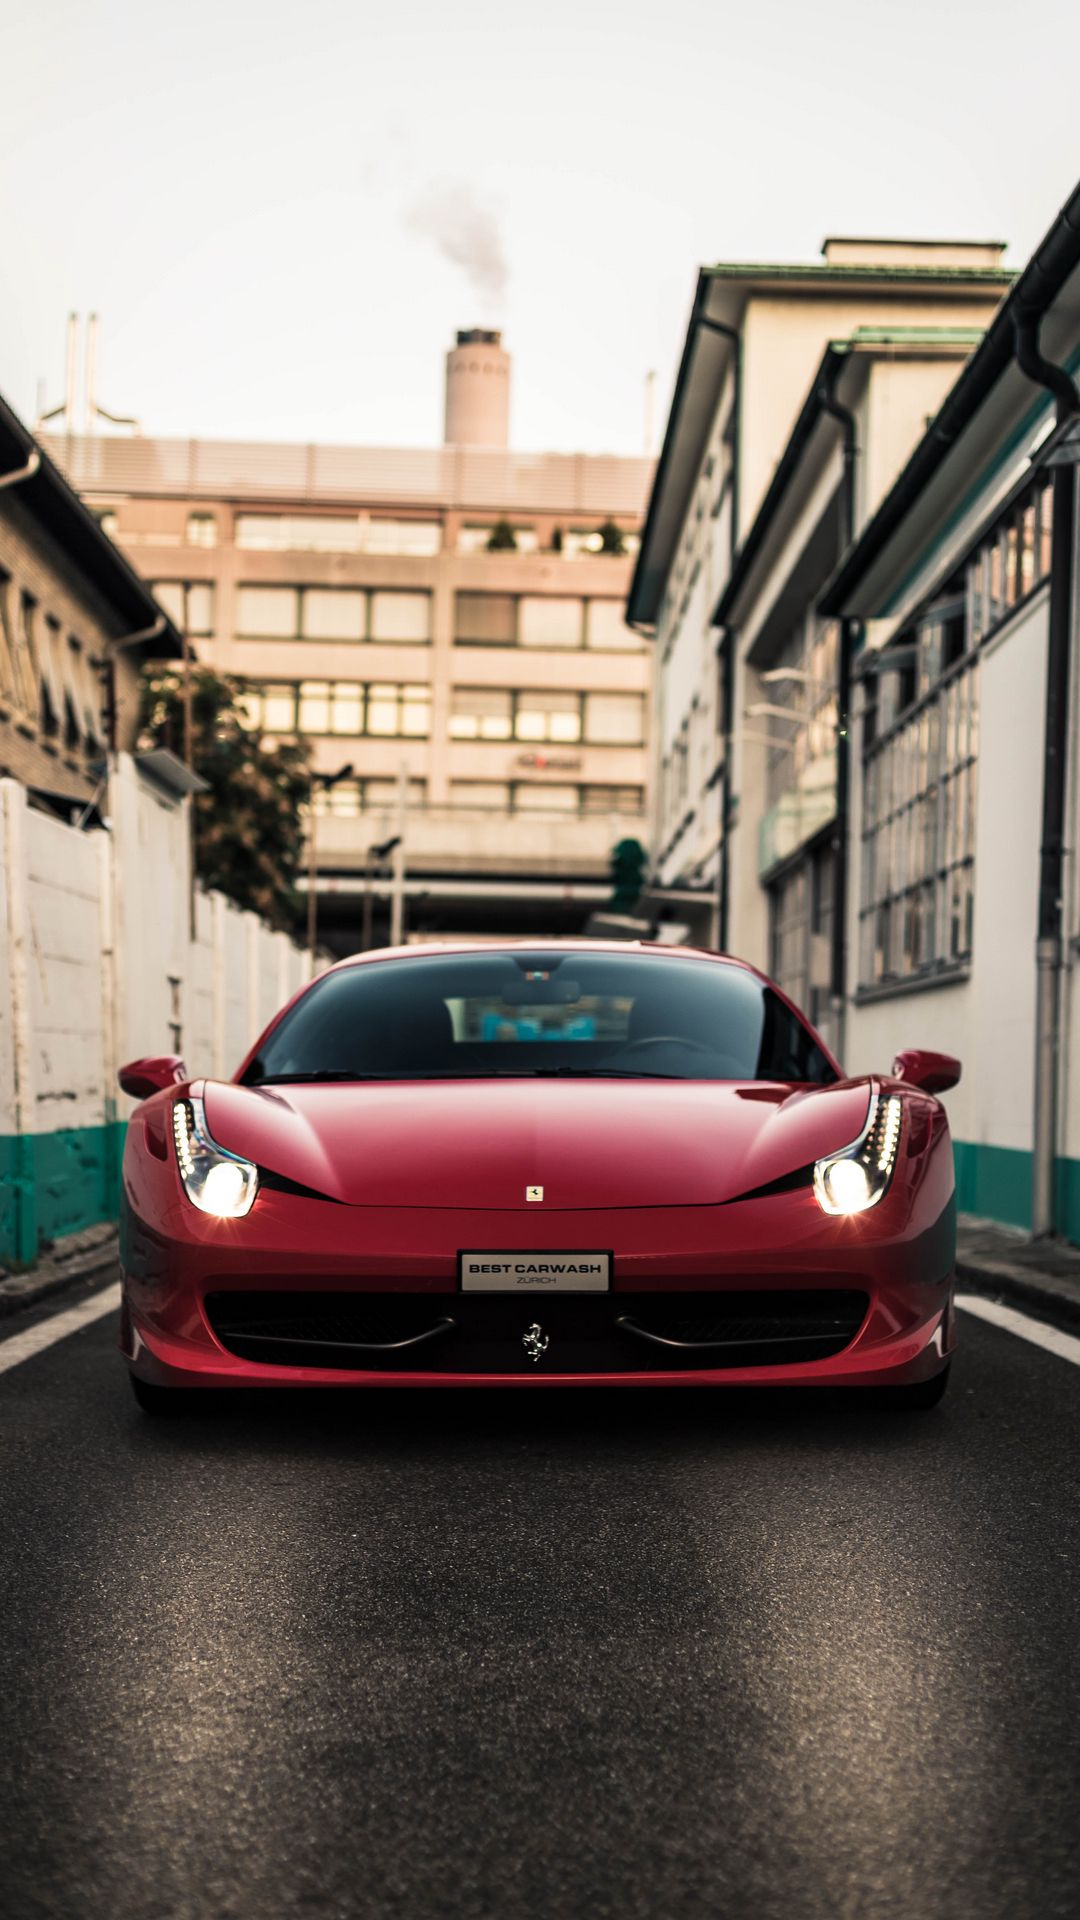 Ferrari Sports Wallpapers Free Download